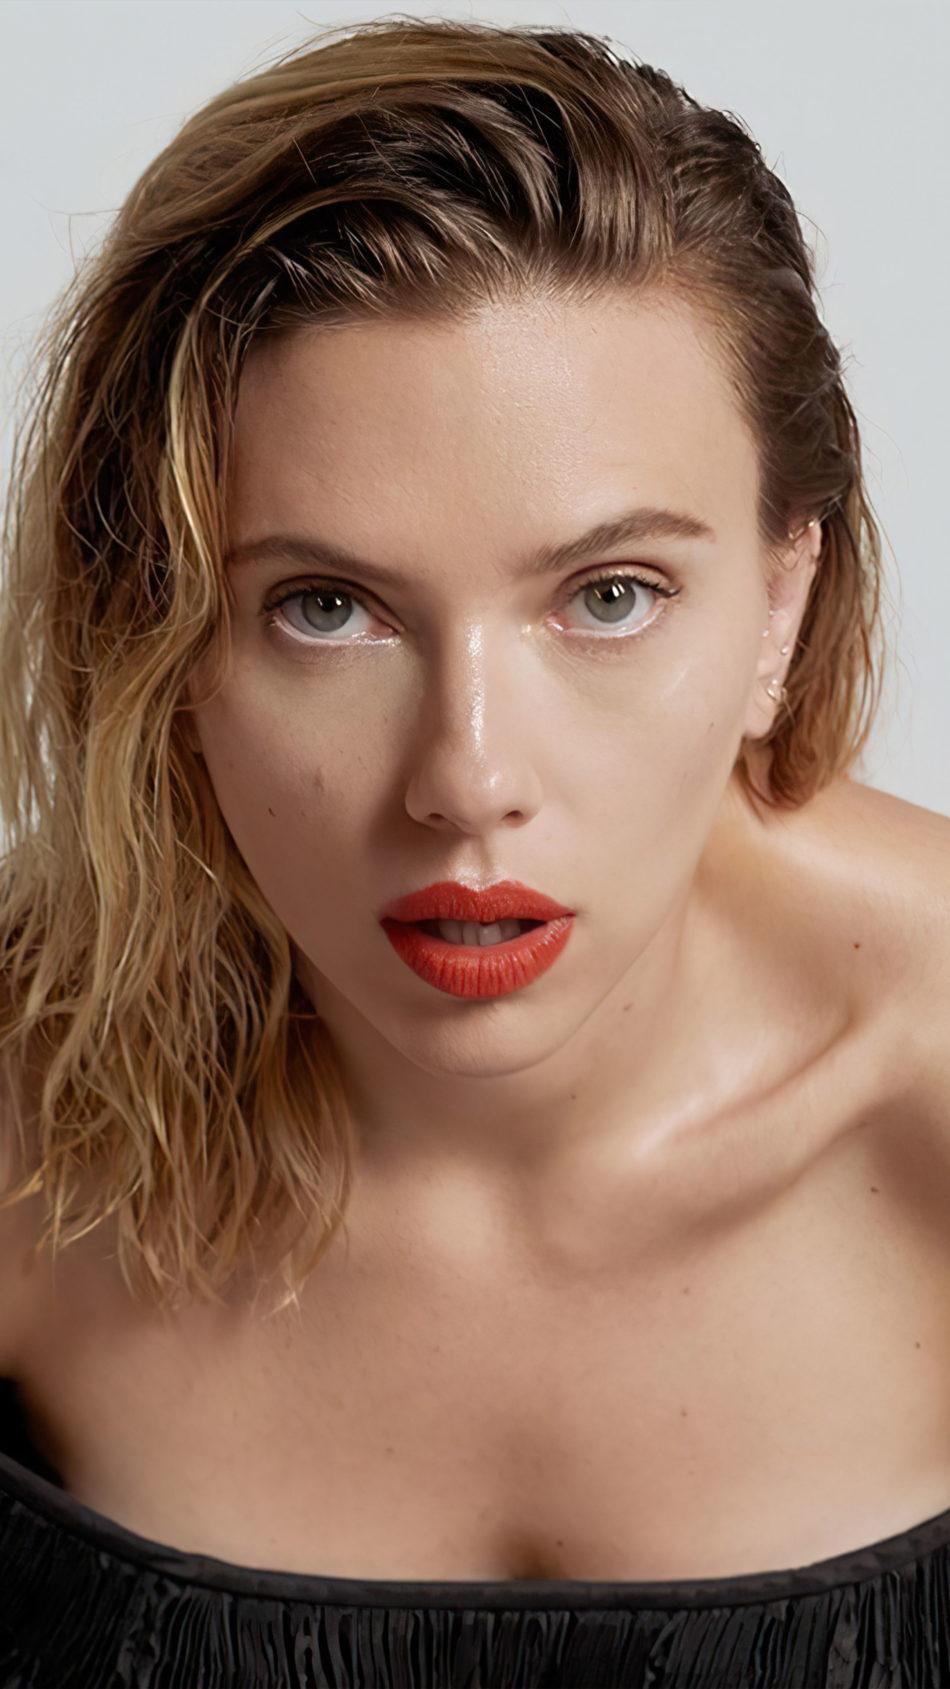 Scarlett Johansson Vanity Fair Photoshoot 4K Ultra HD ...